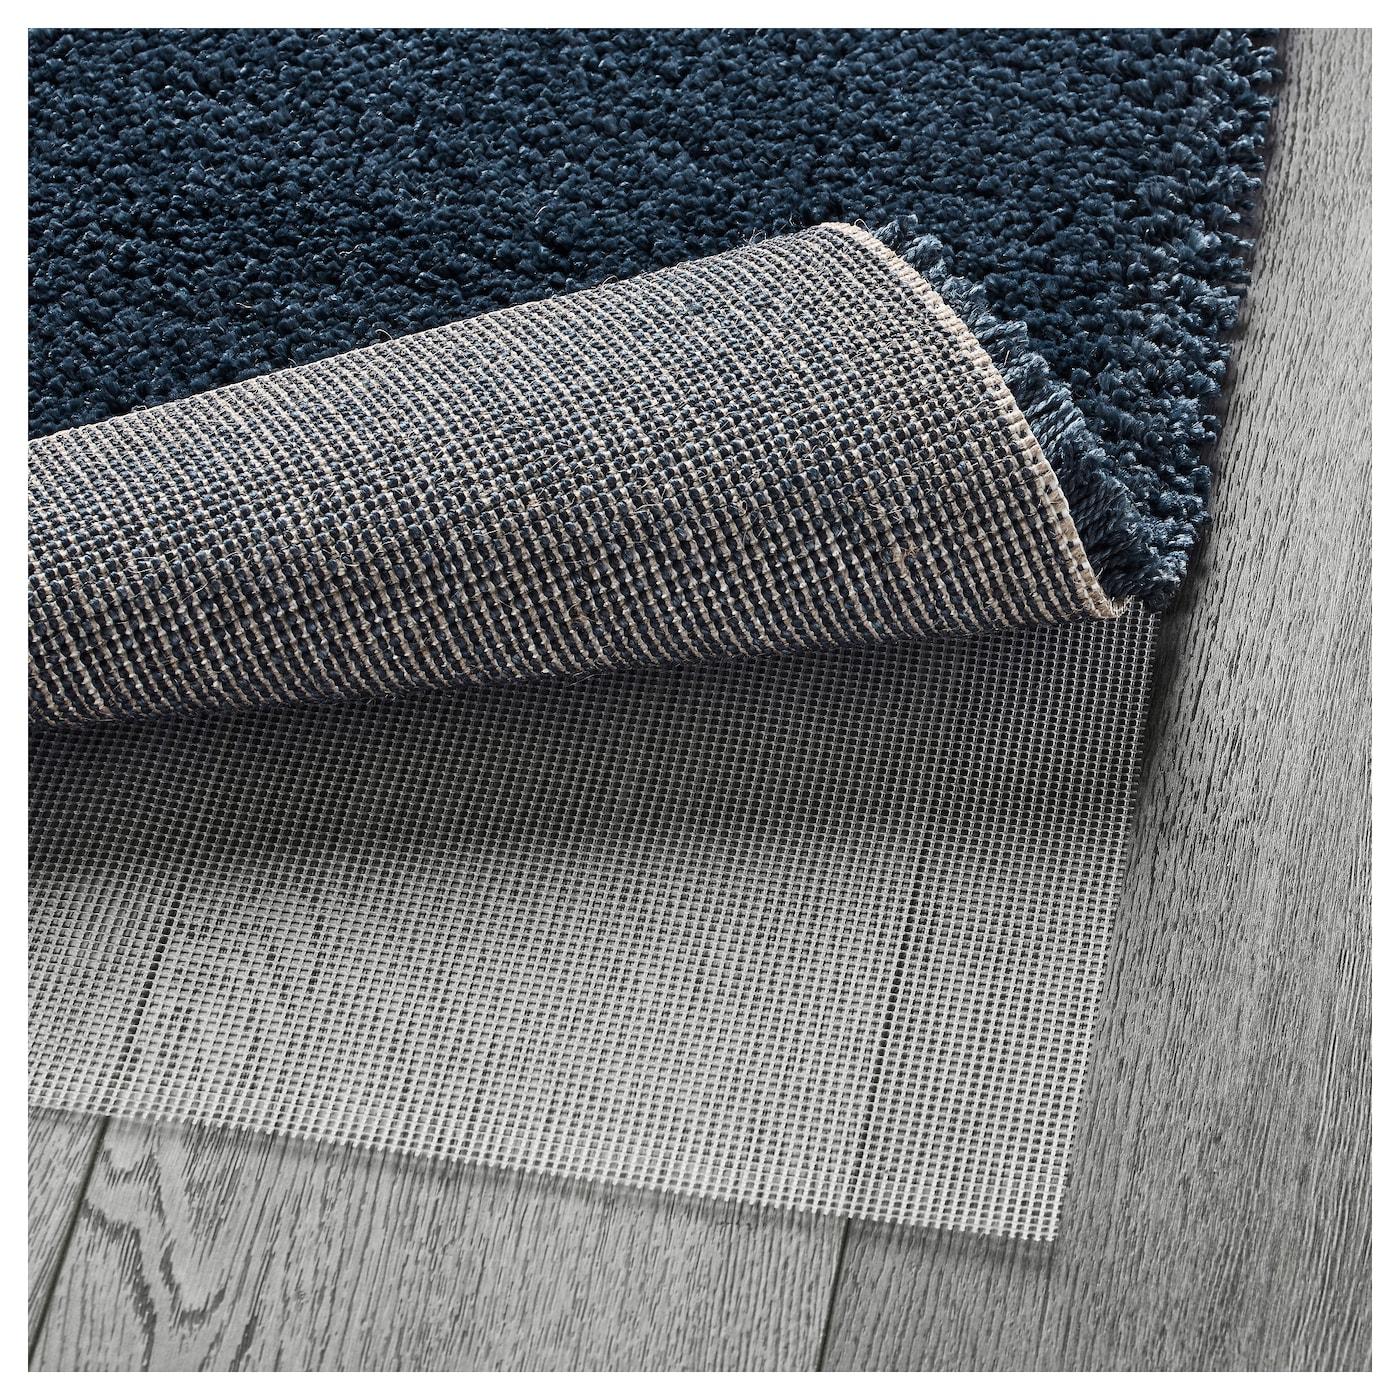 Dum alfombra pelo largo azul oscuro 133 x 195 cm ikea - Ikea textiles y alfombras ...